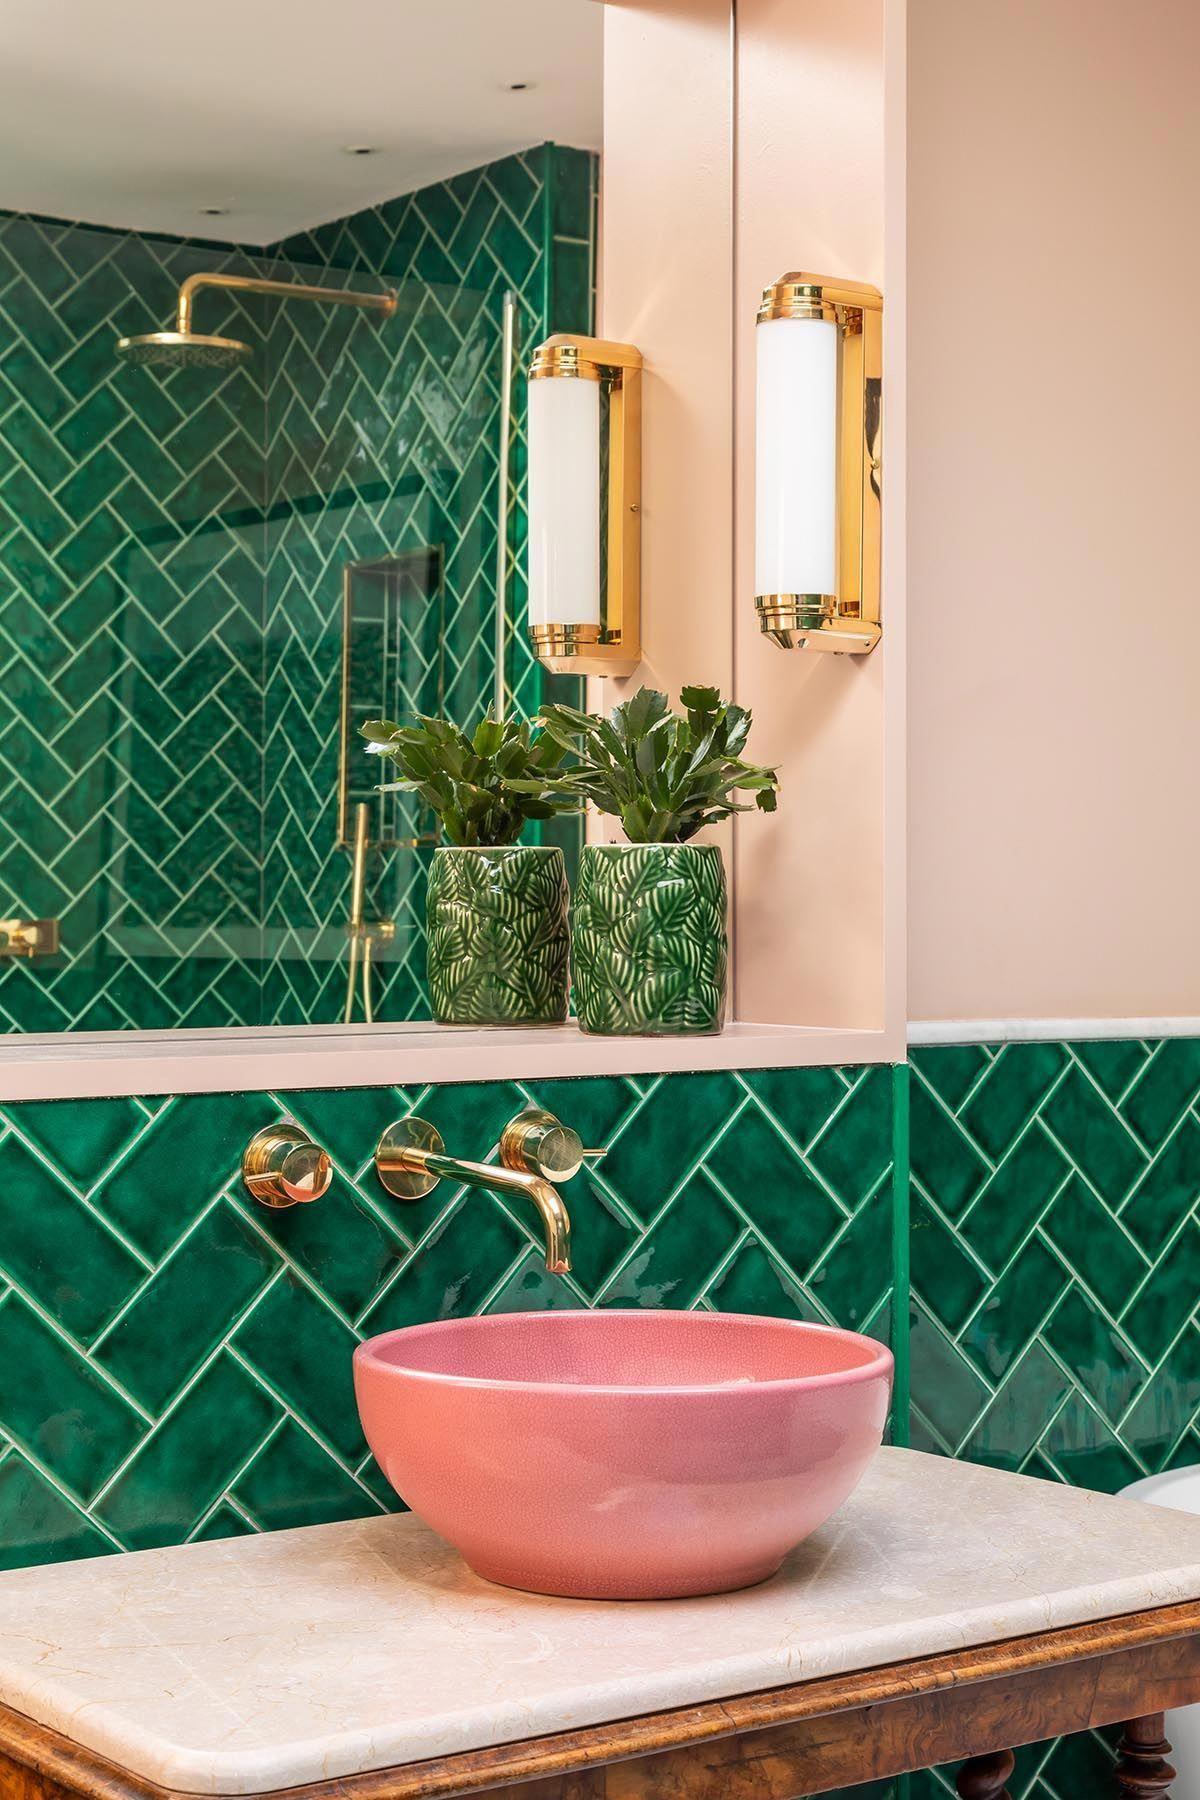 Emerald Green Metro Tiles Pink Ceramic Sinks Marble Topped Antique Barley Twist Leg Table Bras Salle De Bain Design Idee Salle De Bain Couleur Salle De Bain